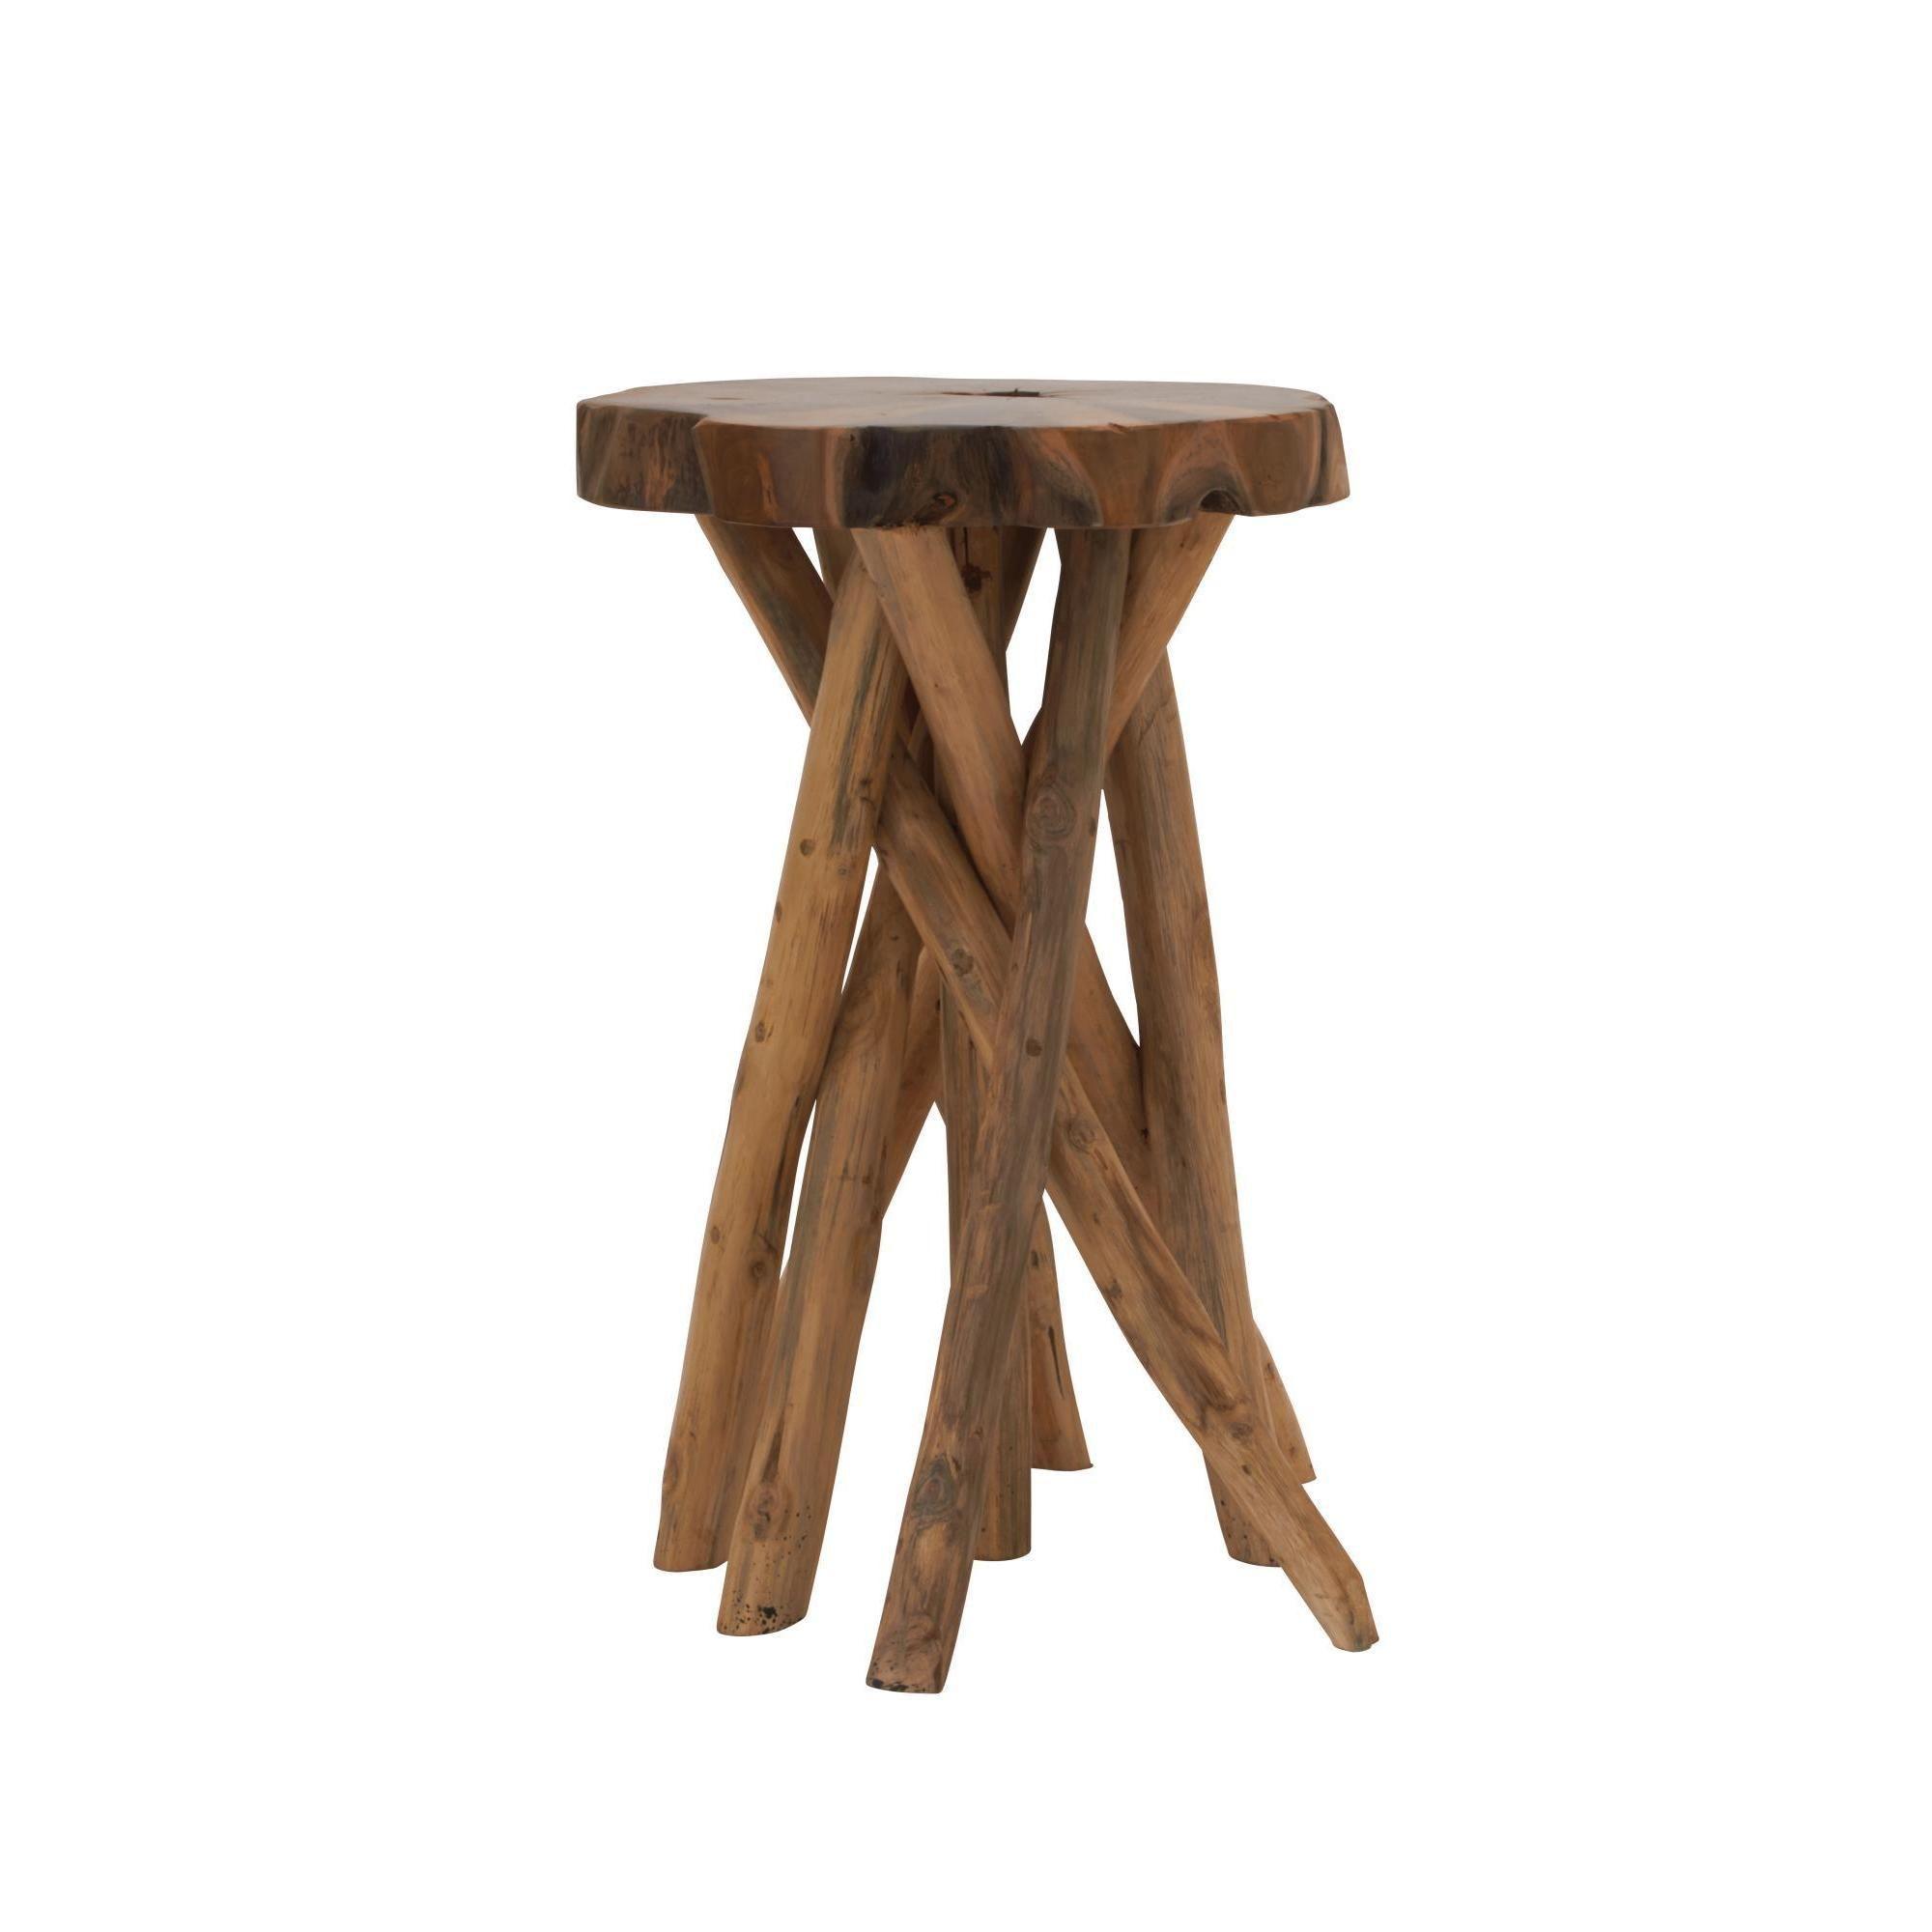 Distinctive Teak Wood Stool 18 Inch Wide X 22 High